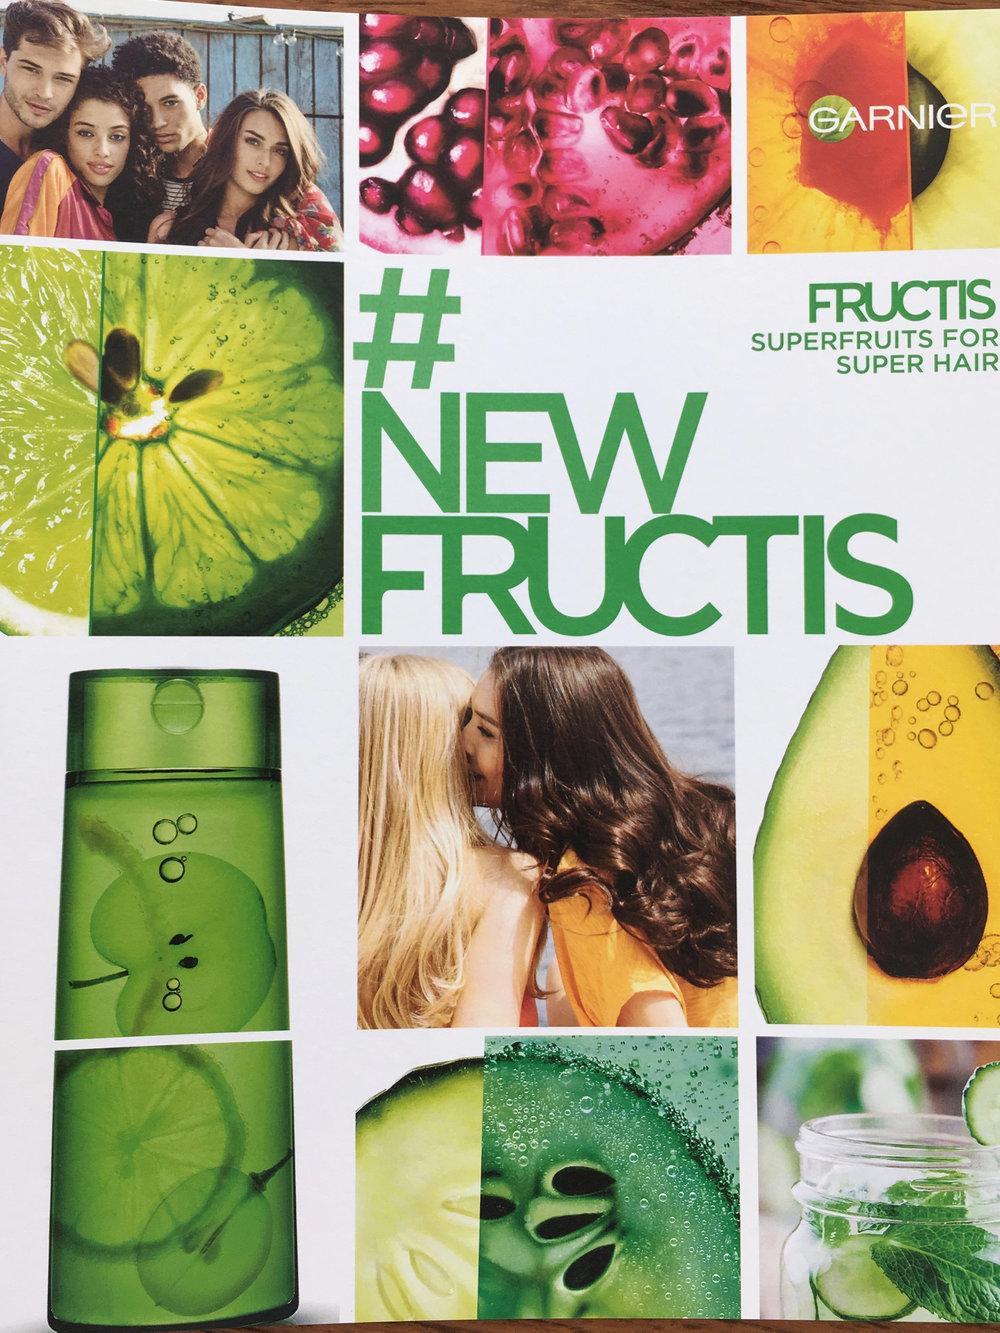 Fructis+Brochure+copy.jpg